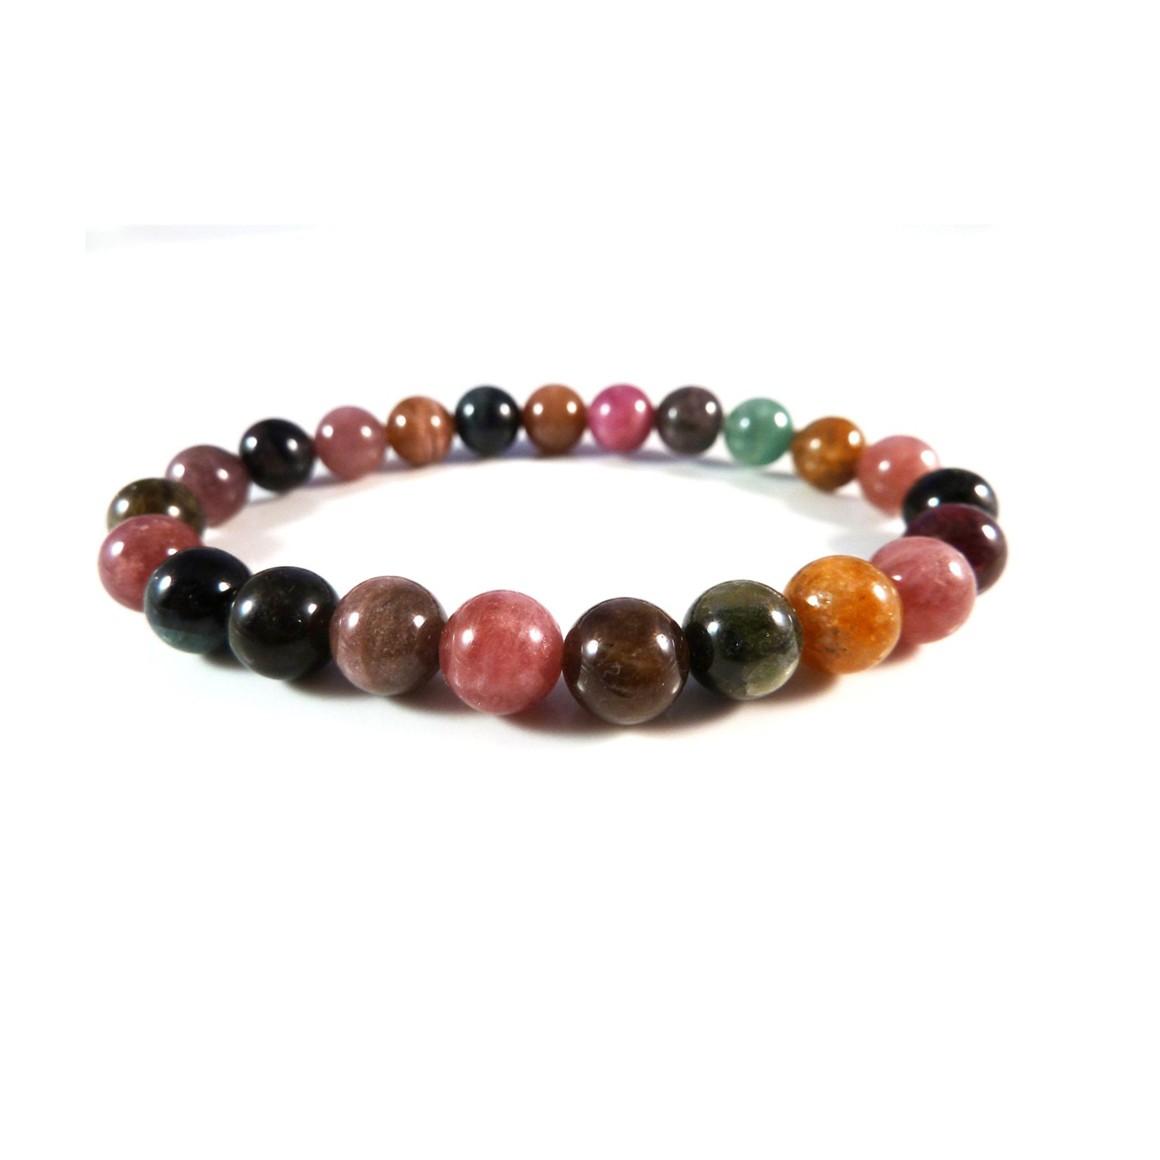 Natural Multicolor Tourmaline Beads Bracelet